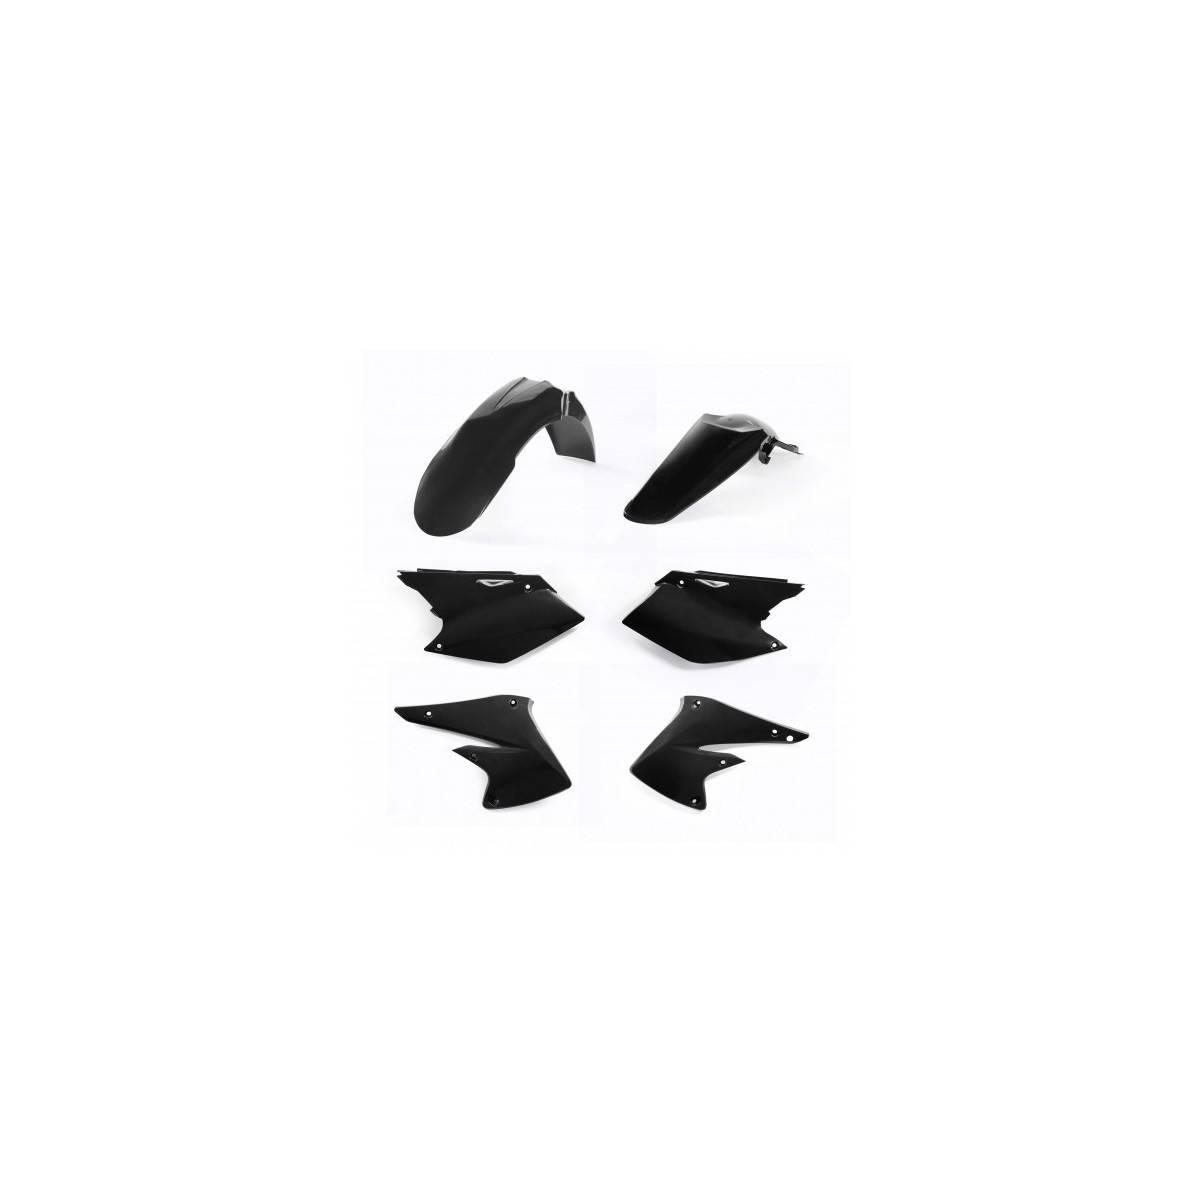 0013148-090 - Kit Plasticos Crf250 10 Negro